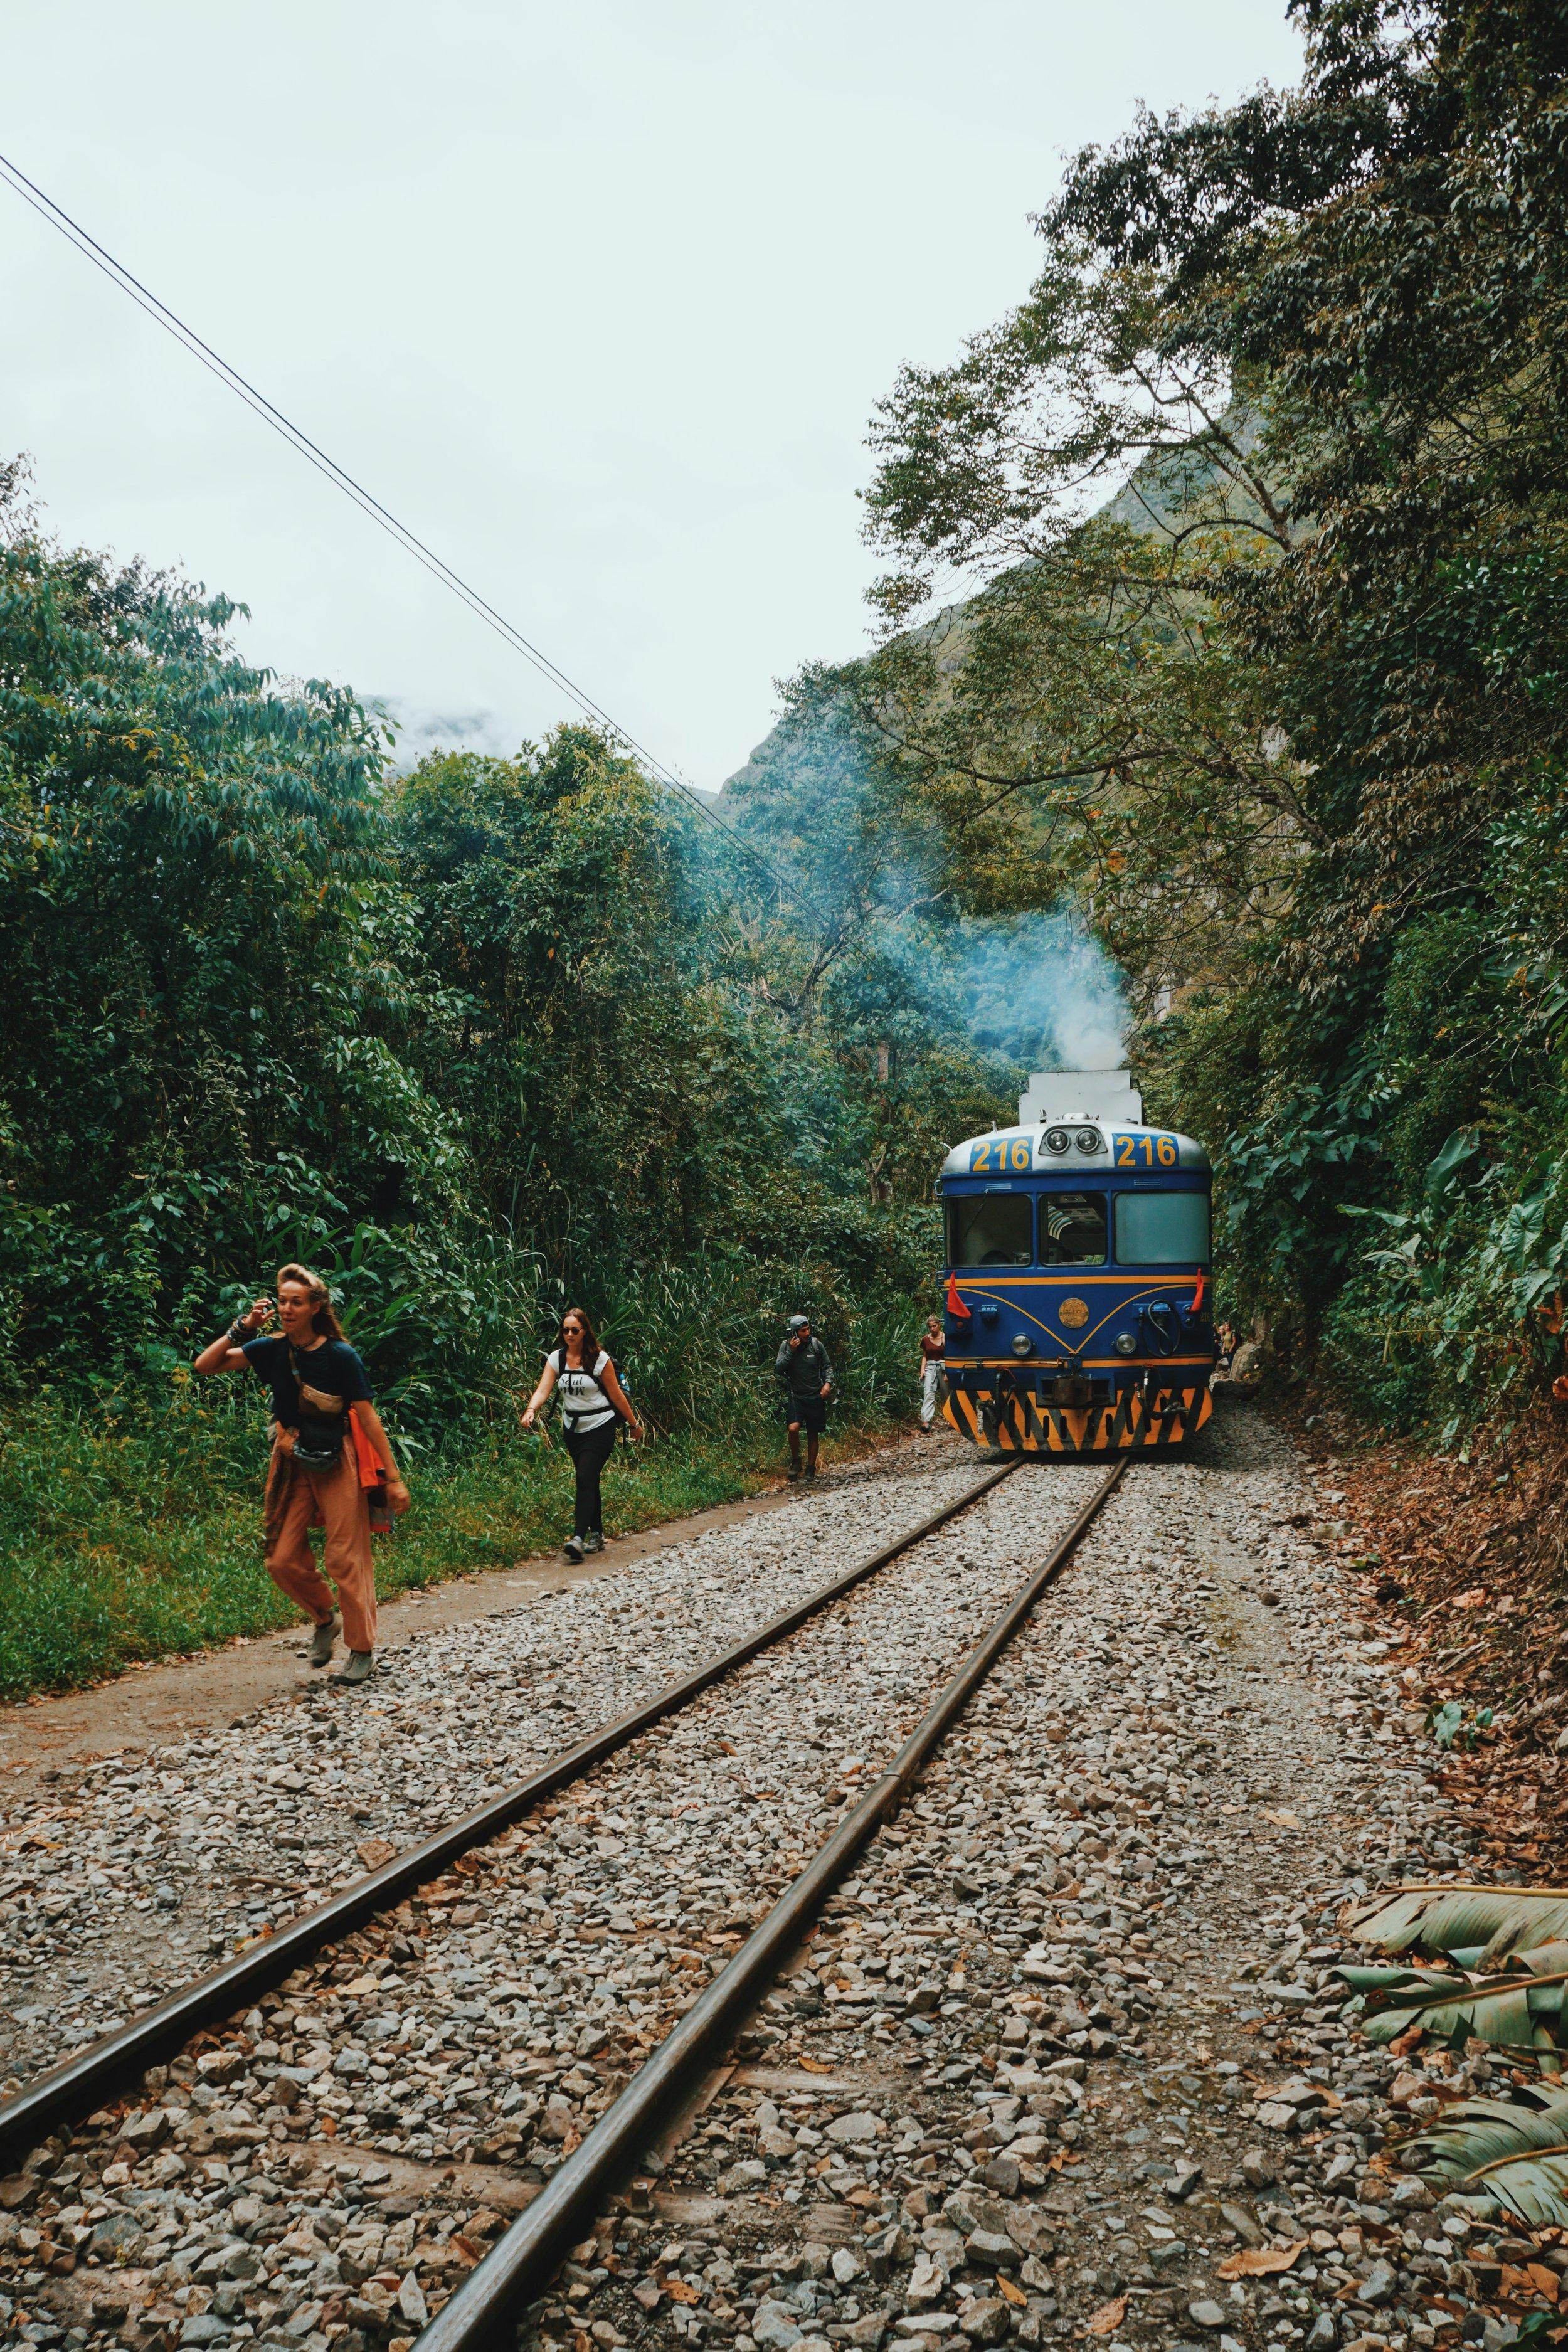 Walking the train tracks to Machu Picchu.